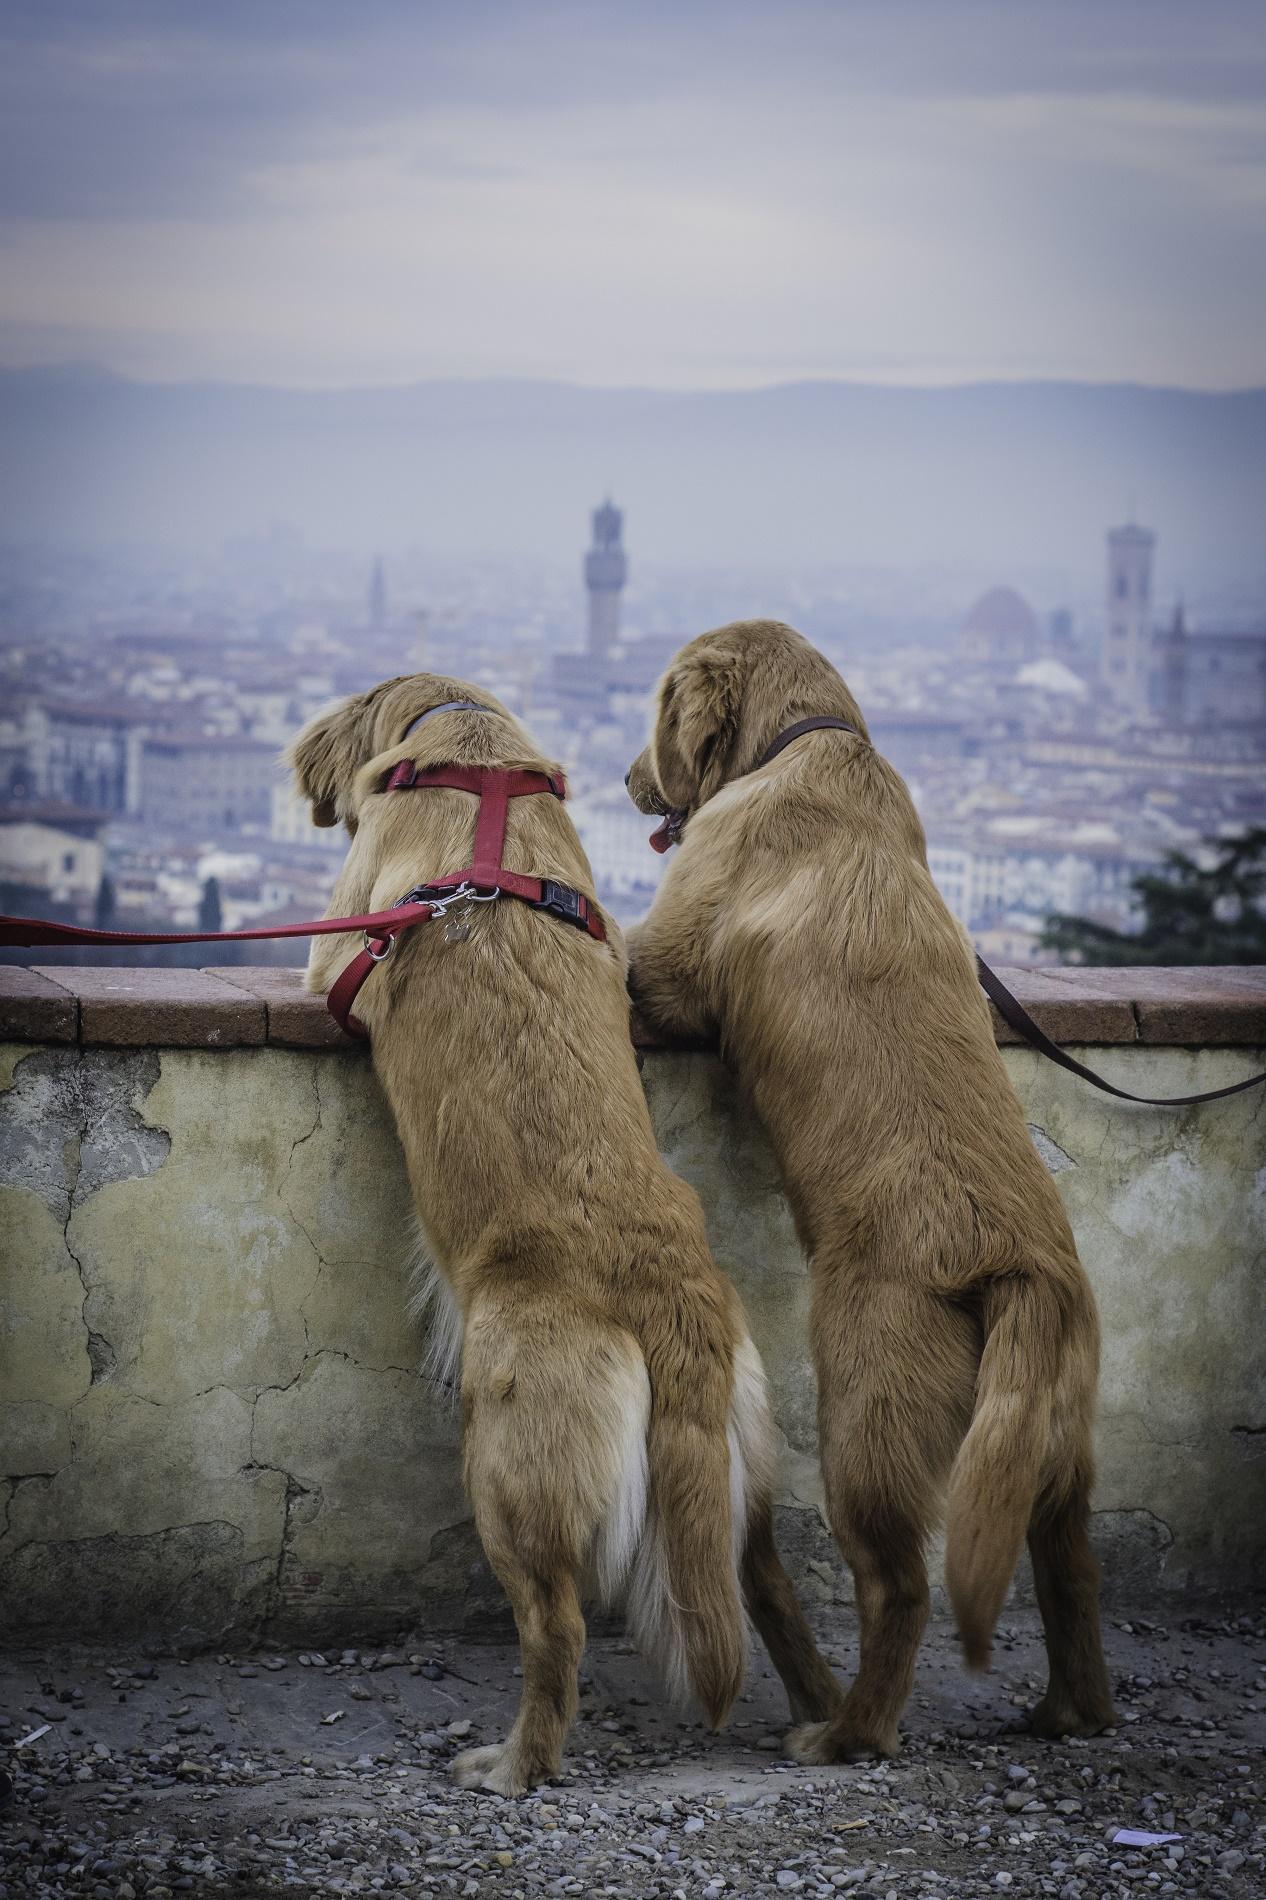 Innamorati a Piazzale Michelangelo...